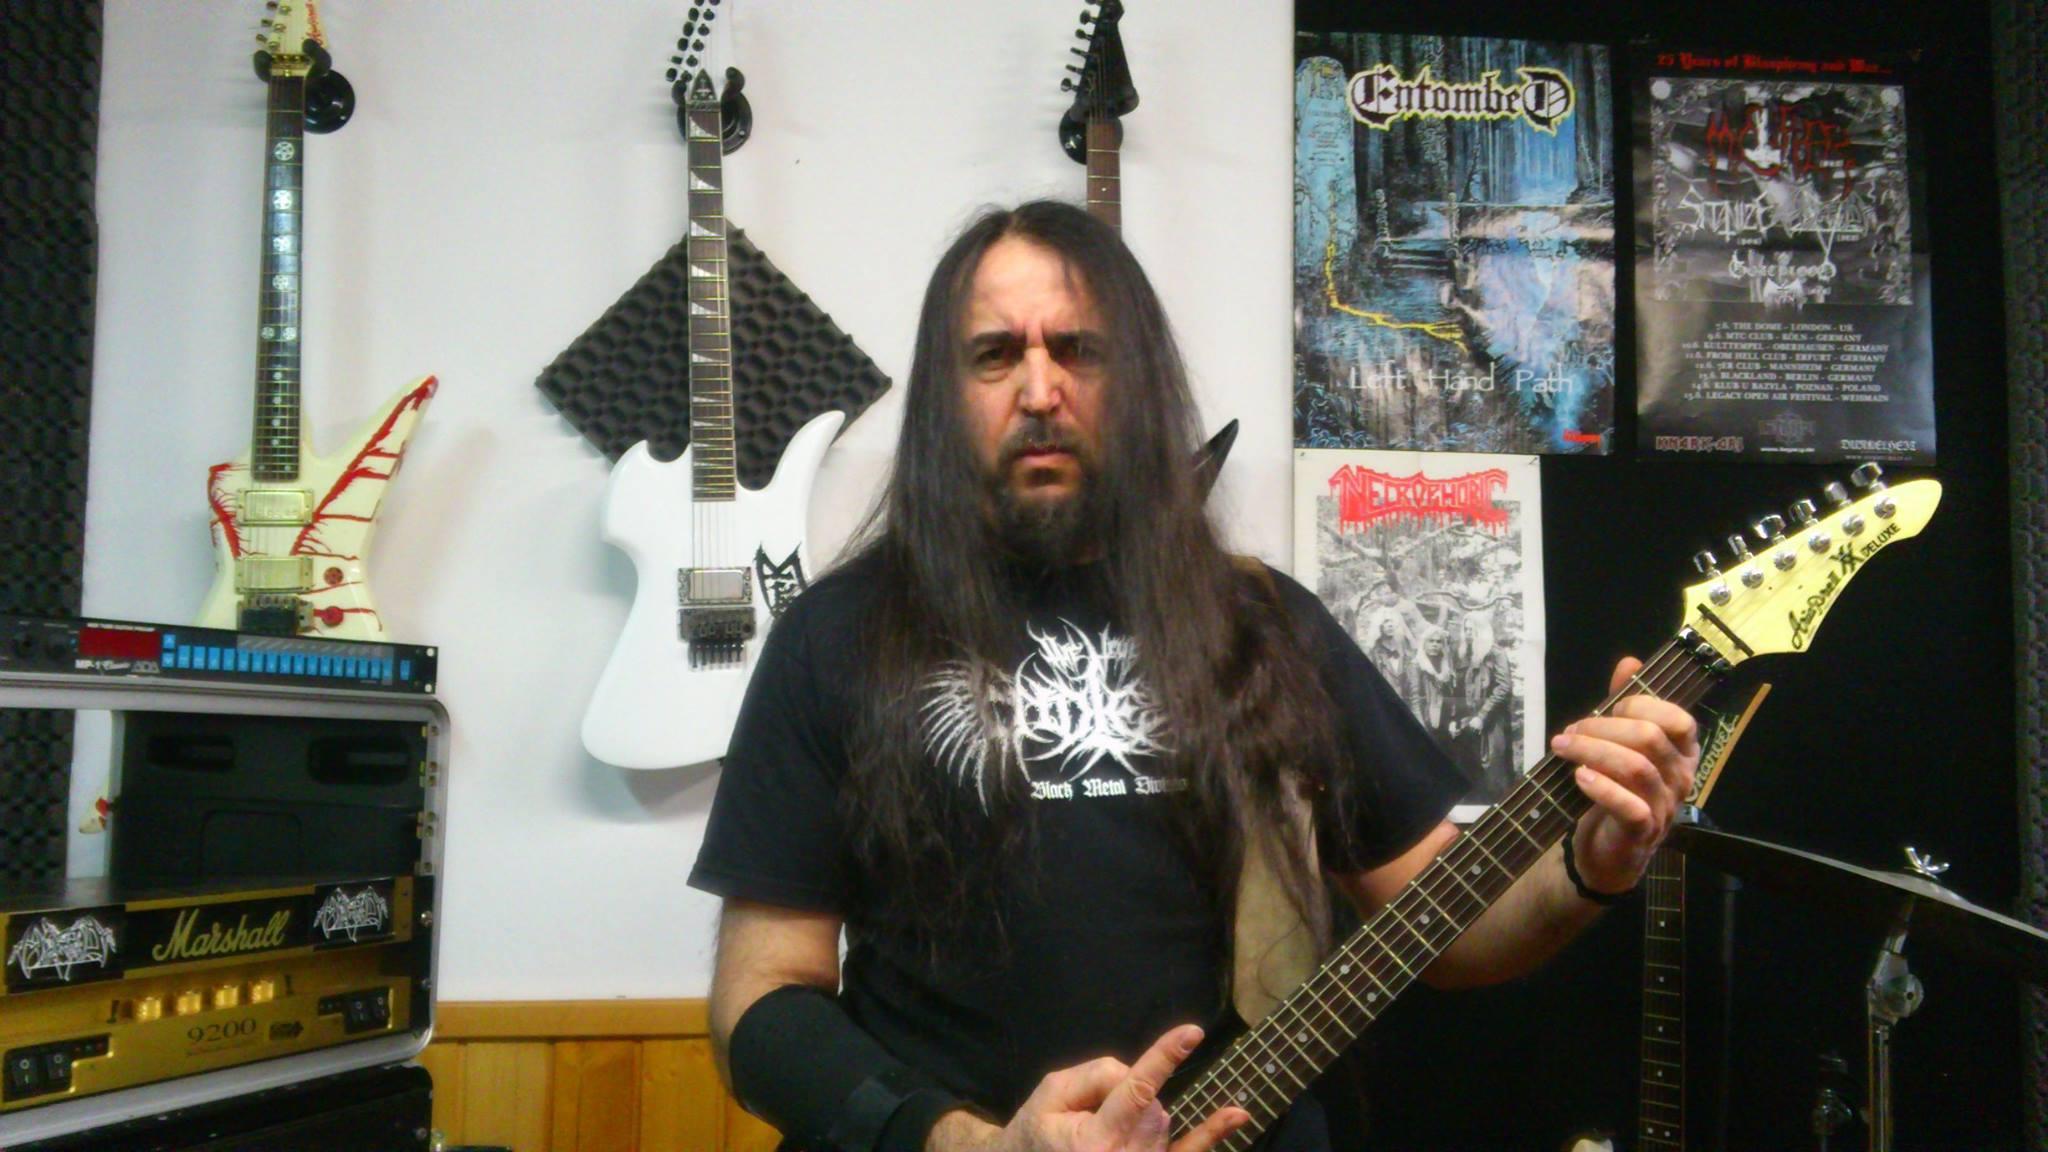 the old blood / old blood / christian montagna / horrid / david belfagor newmann / death metal / diy